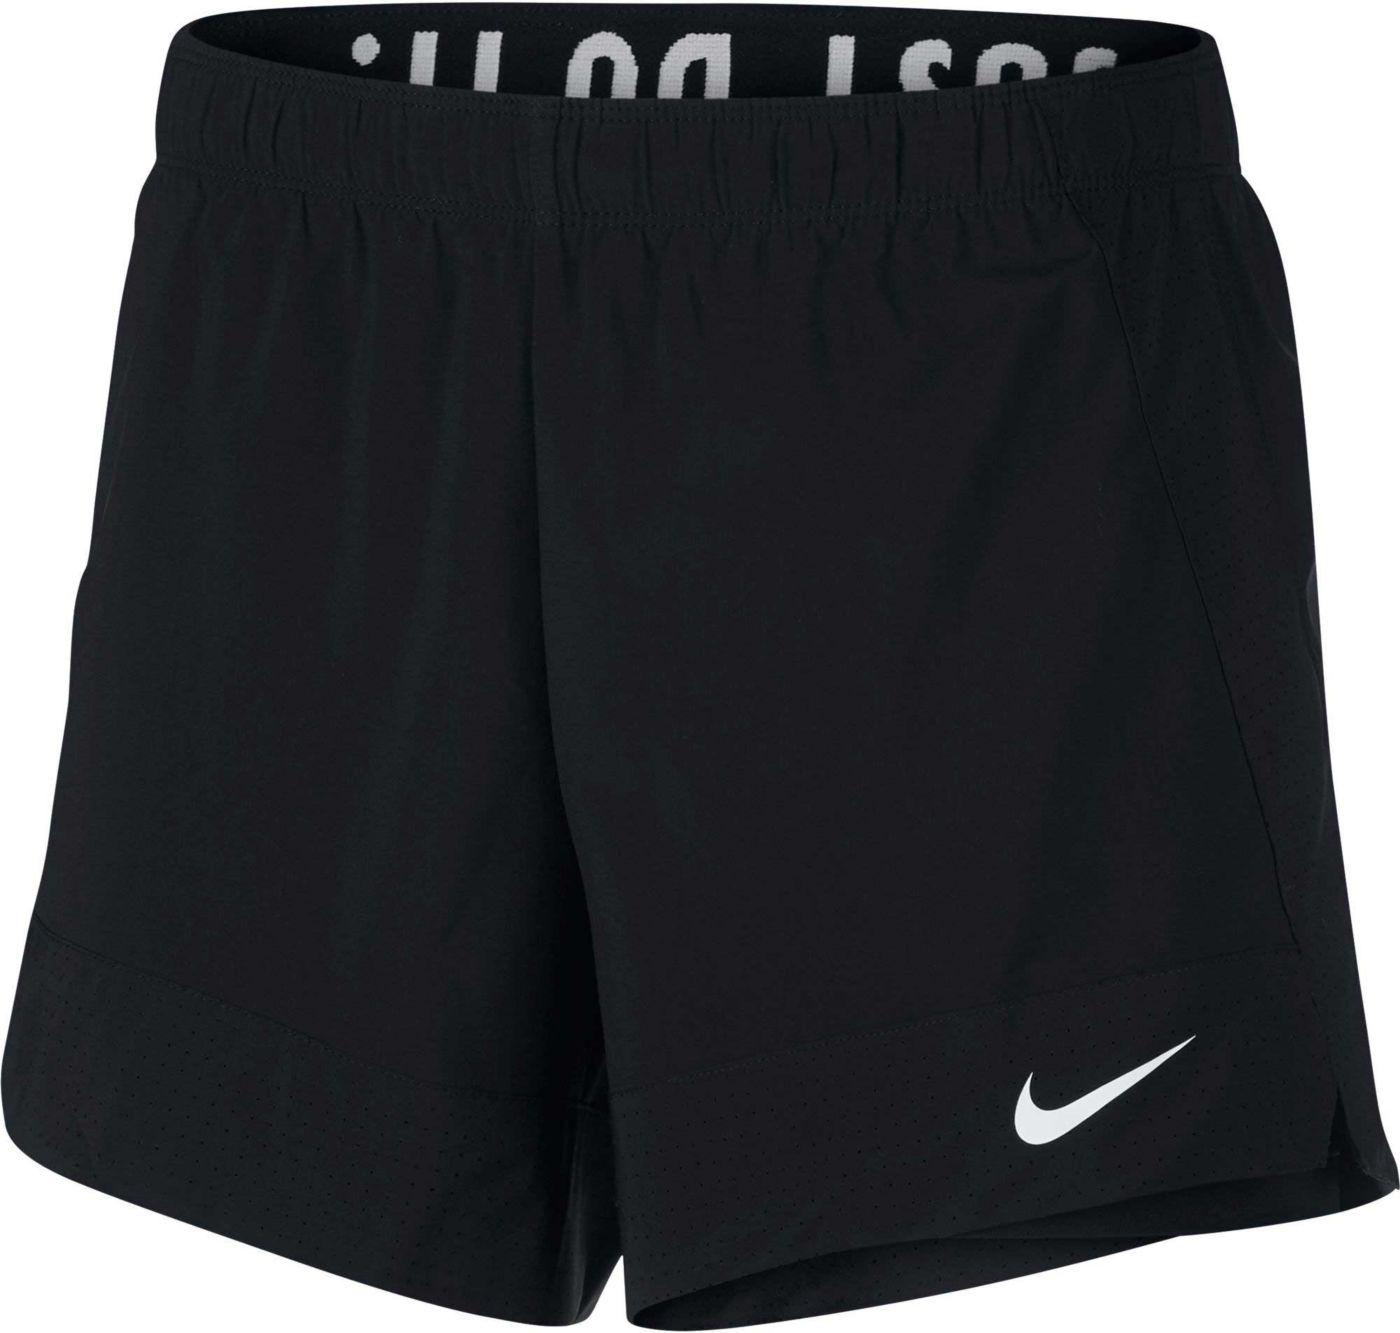 Nike Women's Flex 2-in-1 Training Shorts